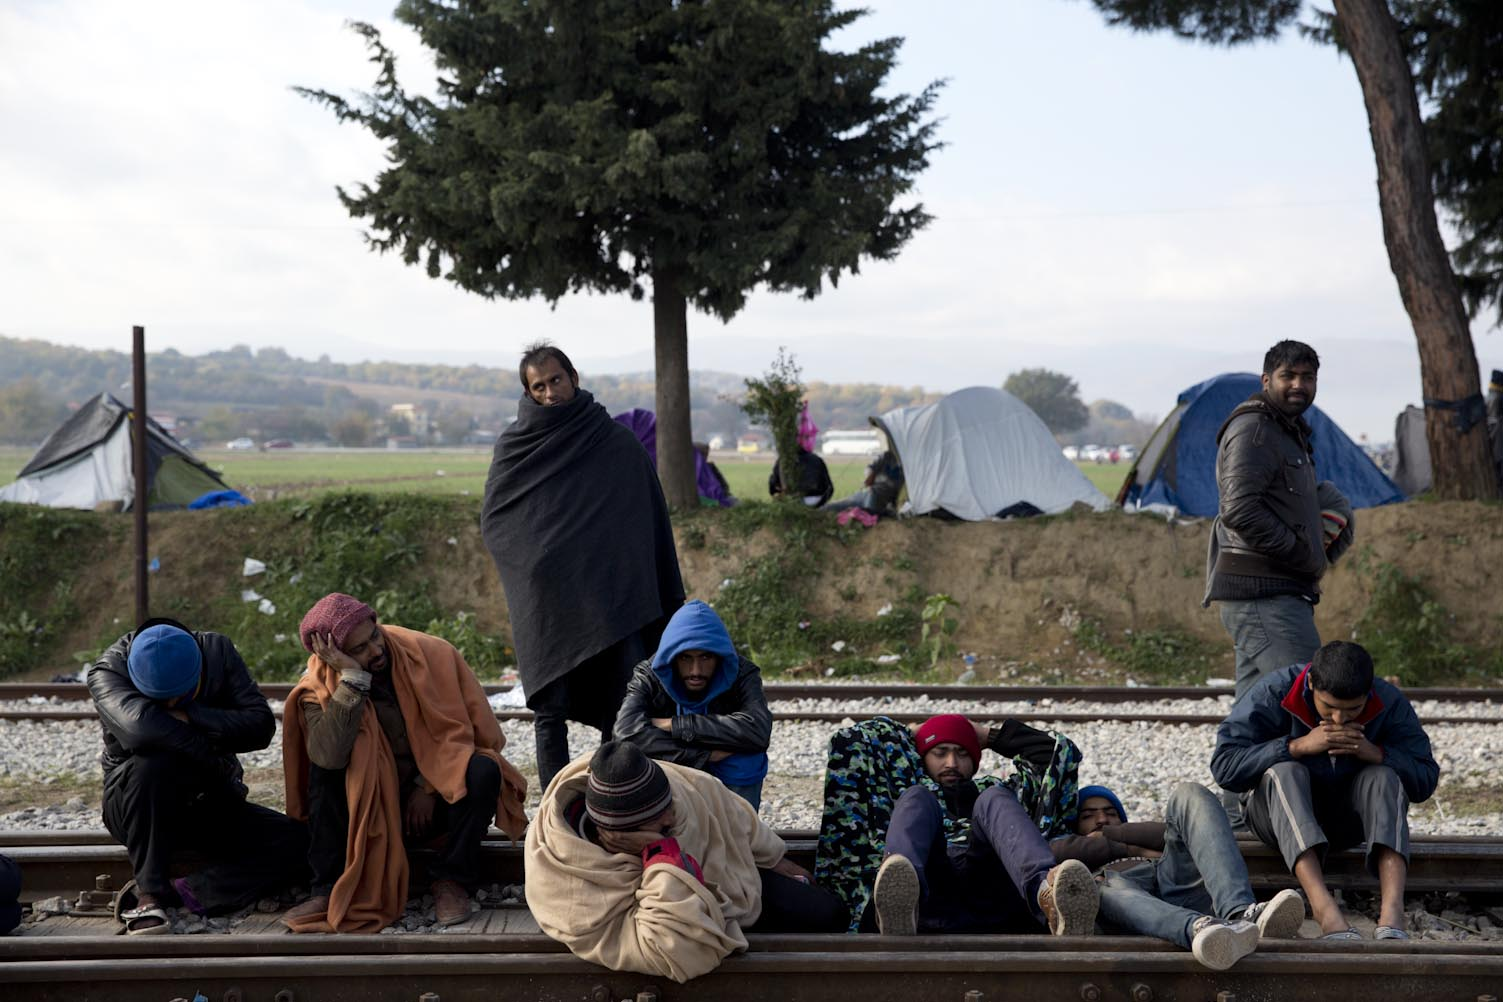 The perils of pakistani migrants heading to europe pulitzer center stopboris Image collections